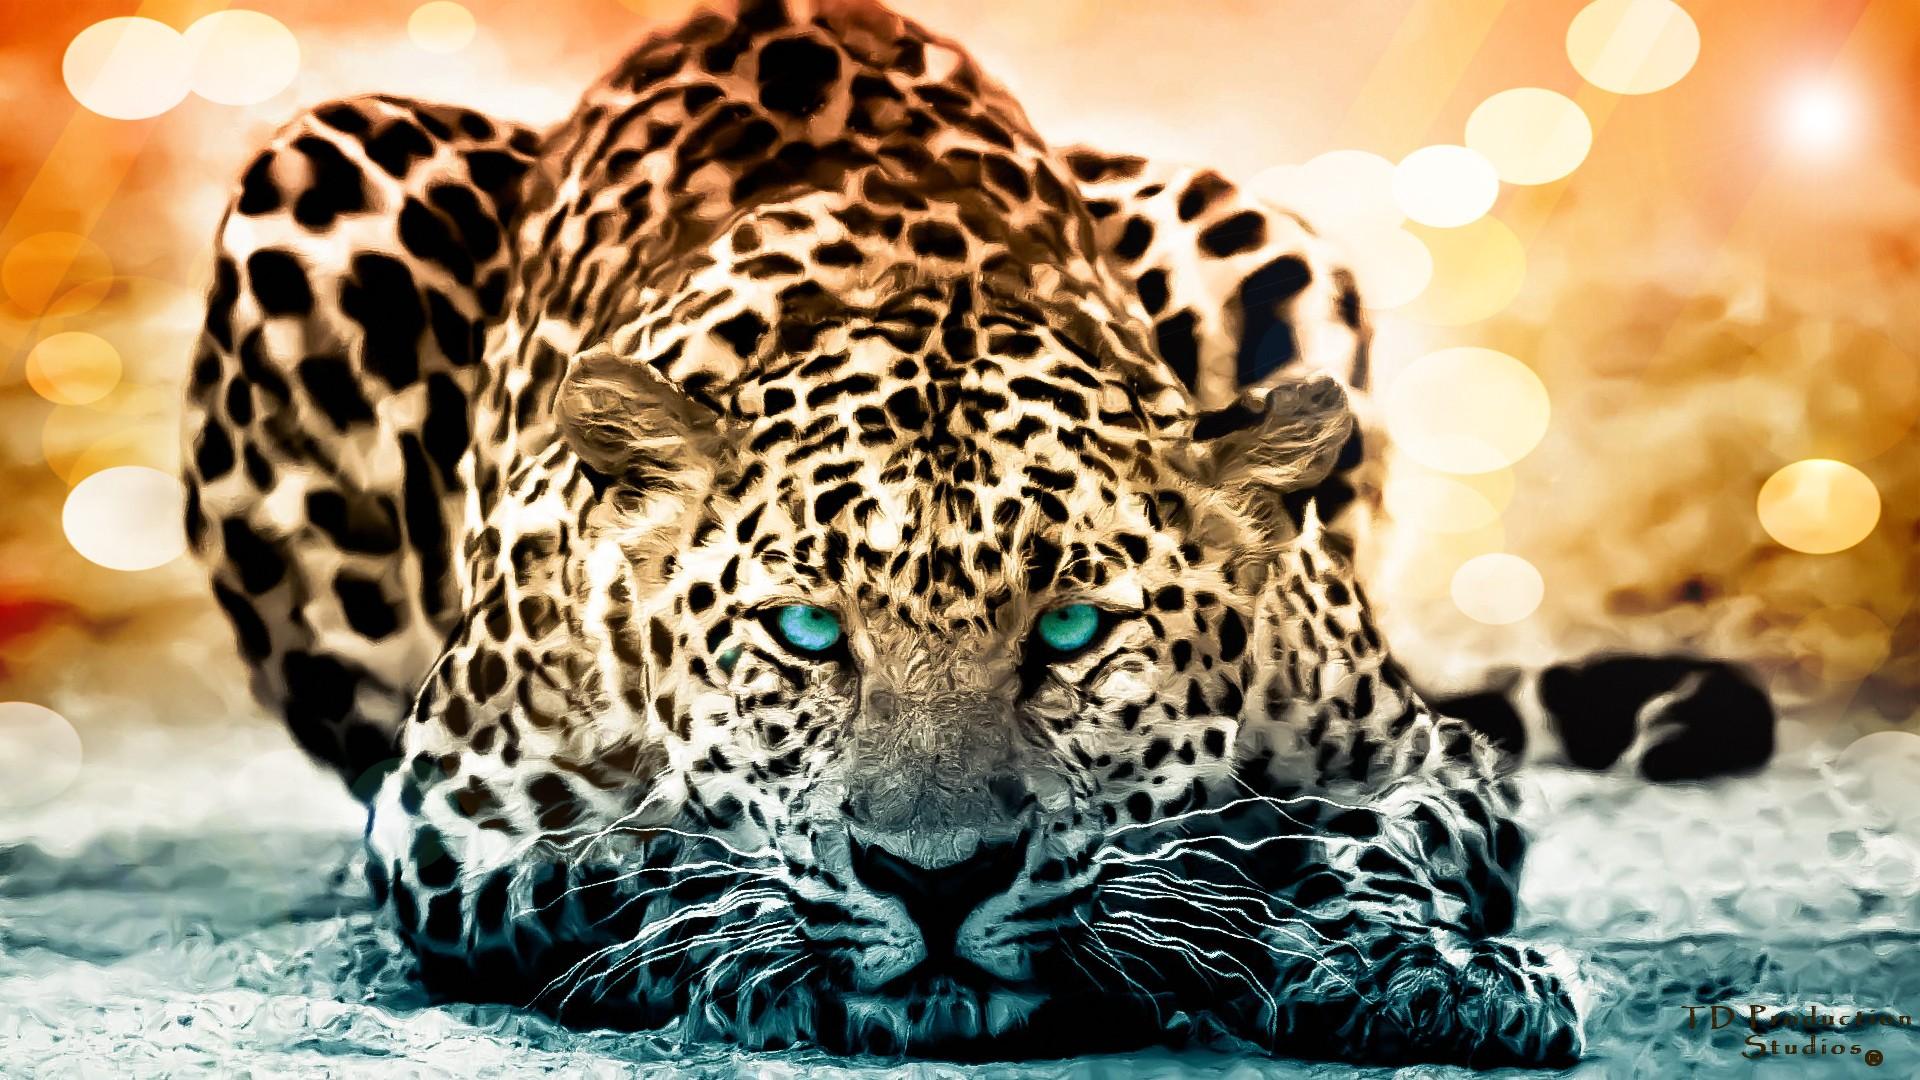 Hd wallpaper jaguar - 159 Jaguar Hd Wallpapers Backgrounds Wallpaper Abyss